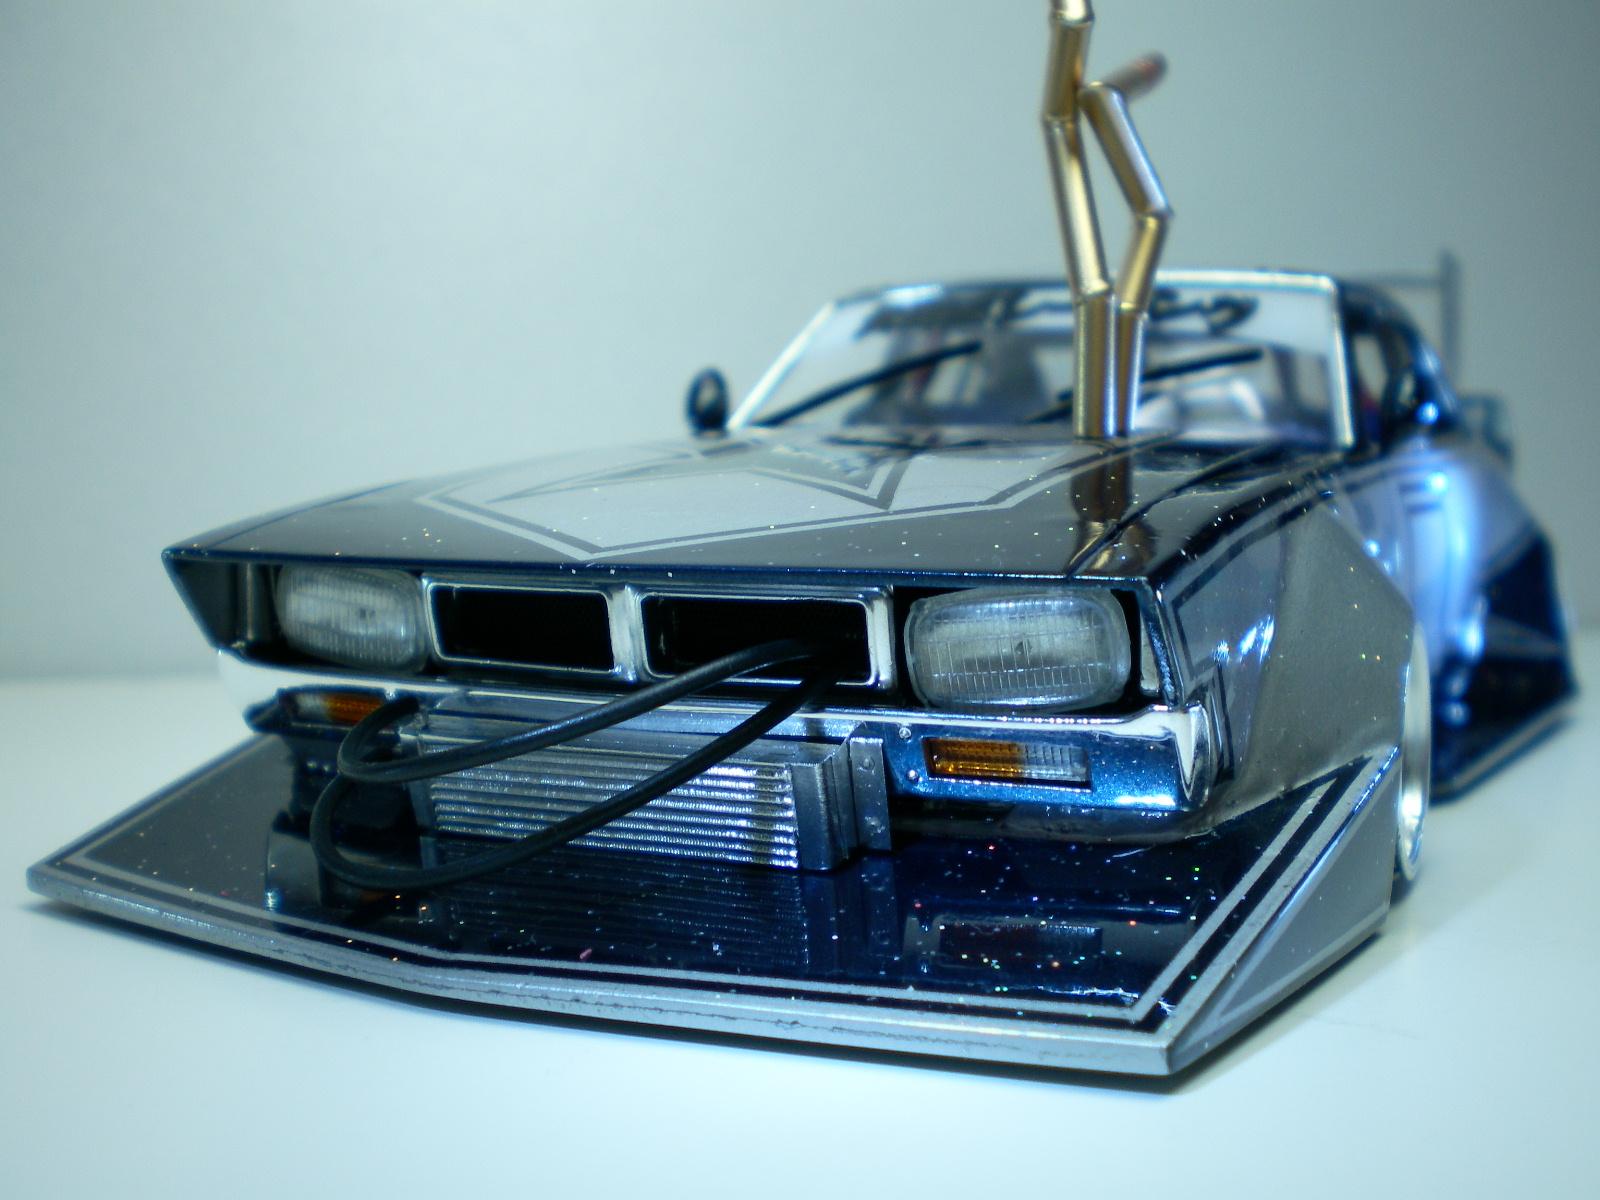 Nissan Skyline C110 model